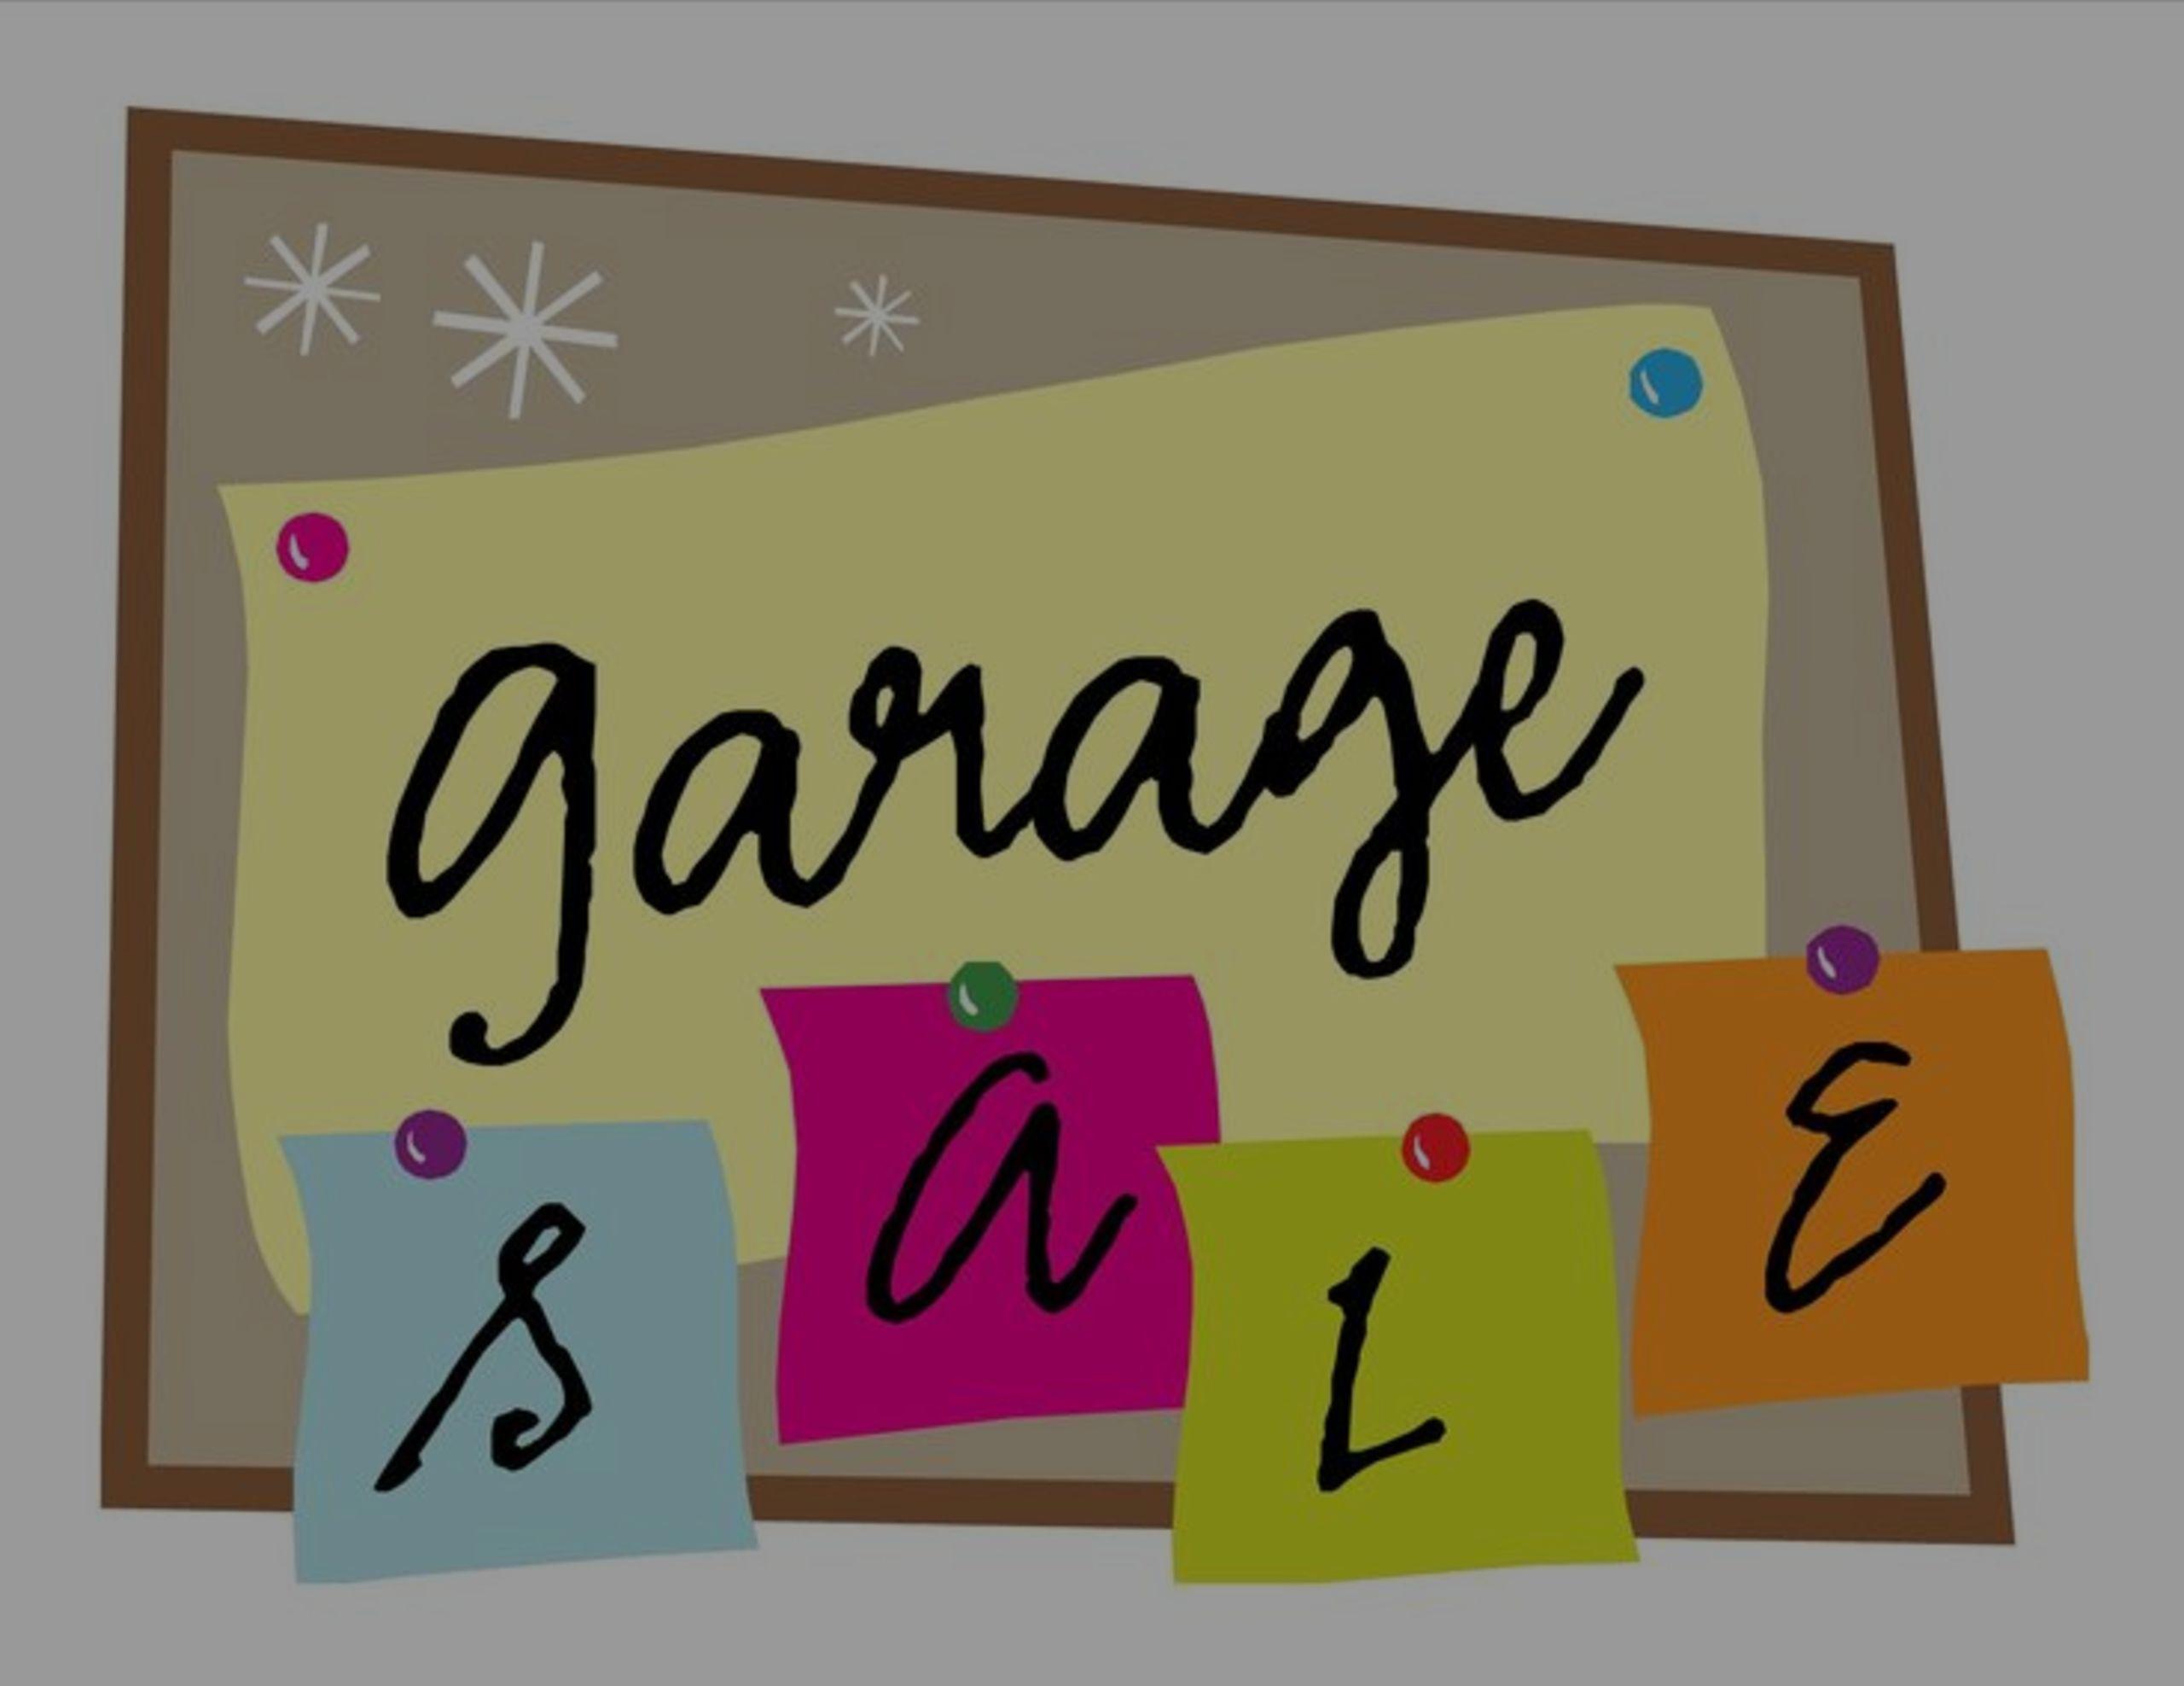 Heritage Park Irvine Community Garage & Yard Sale | Bruce Clark | Orange County Real Estate Agent